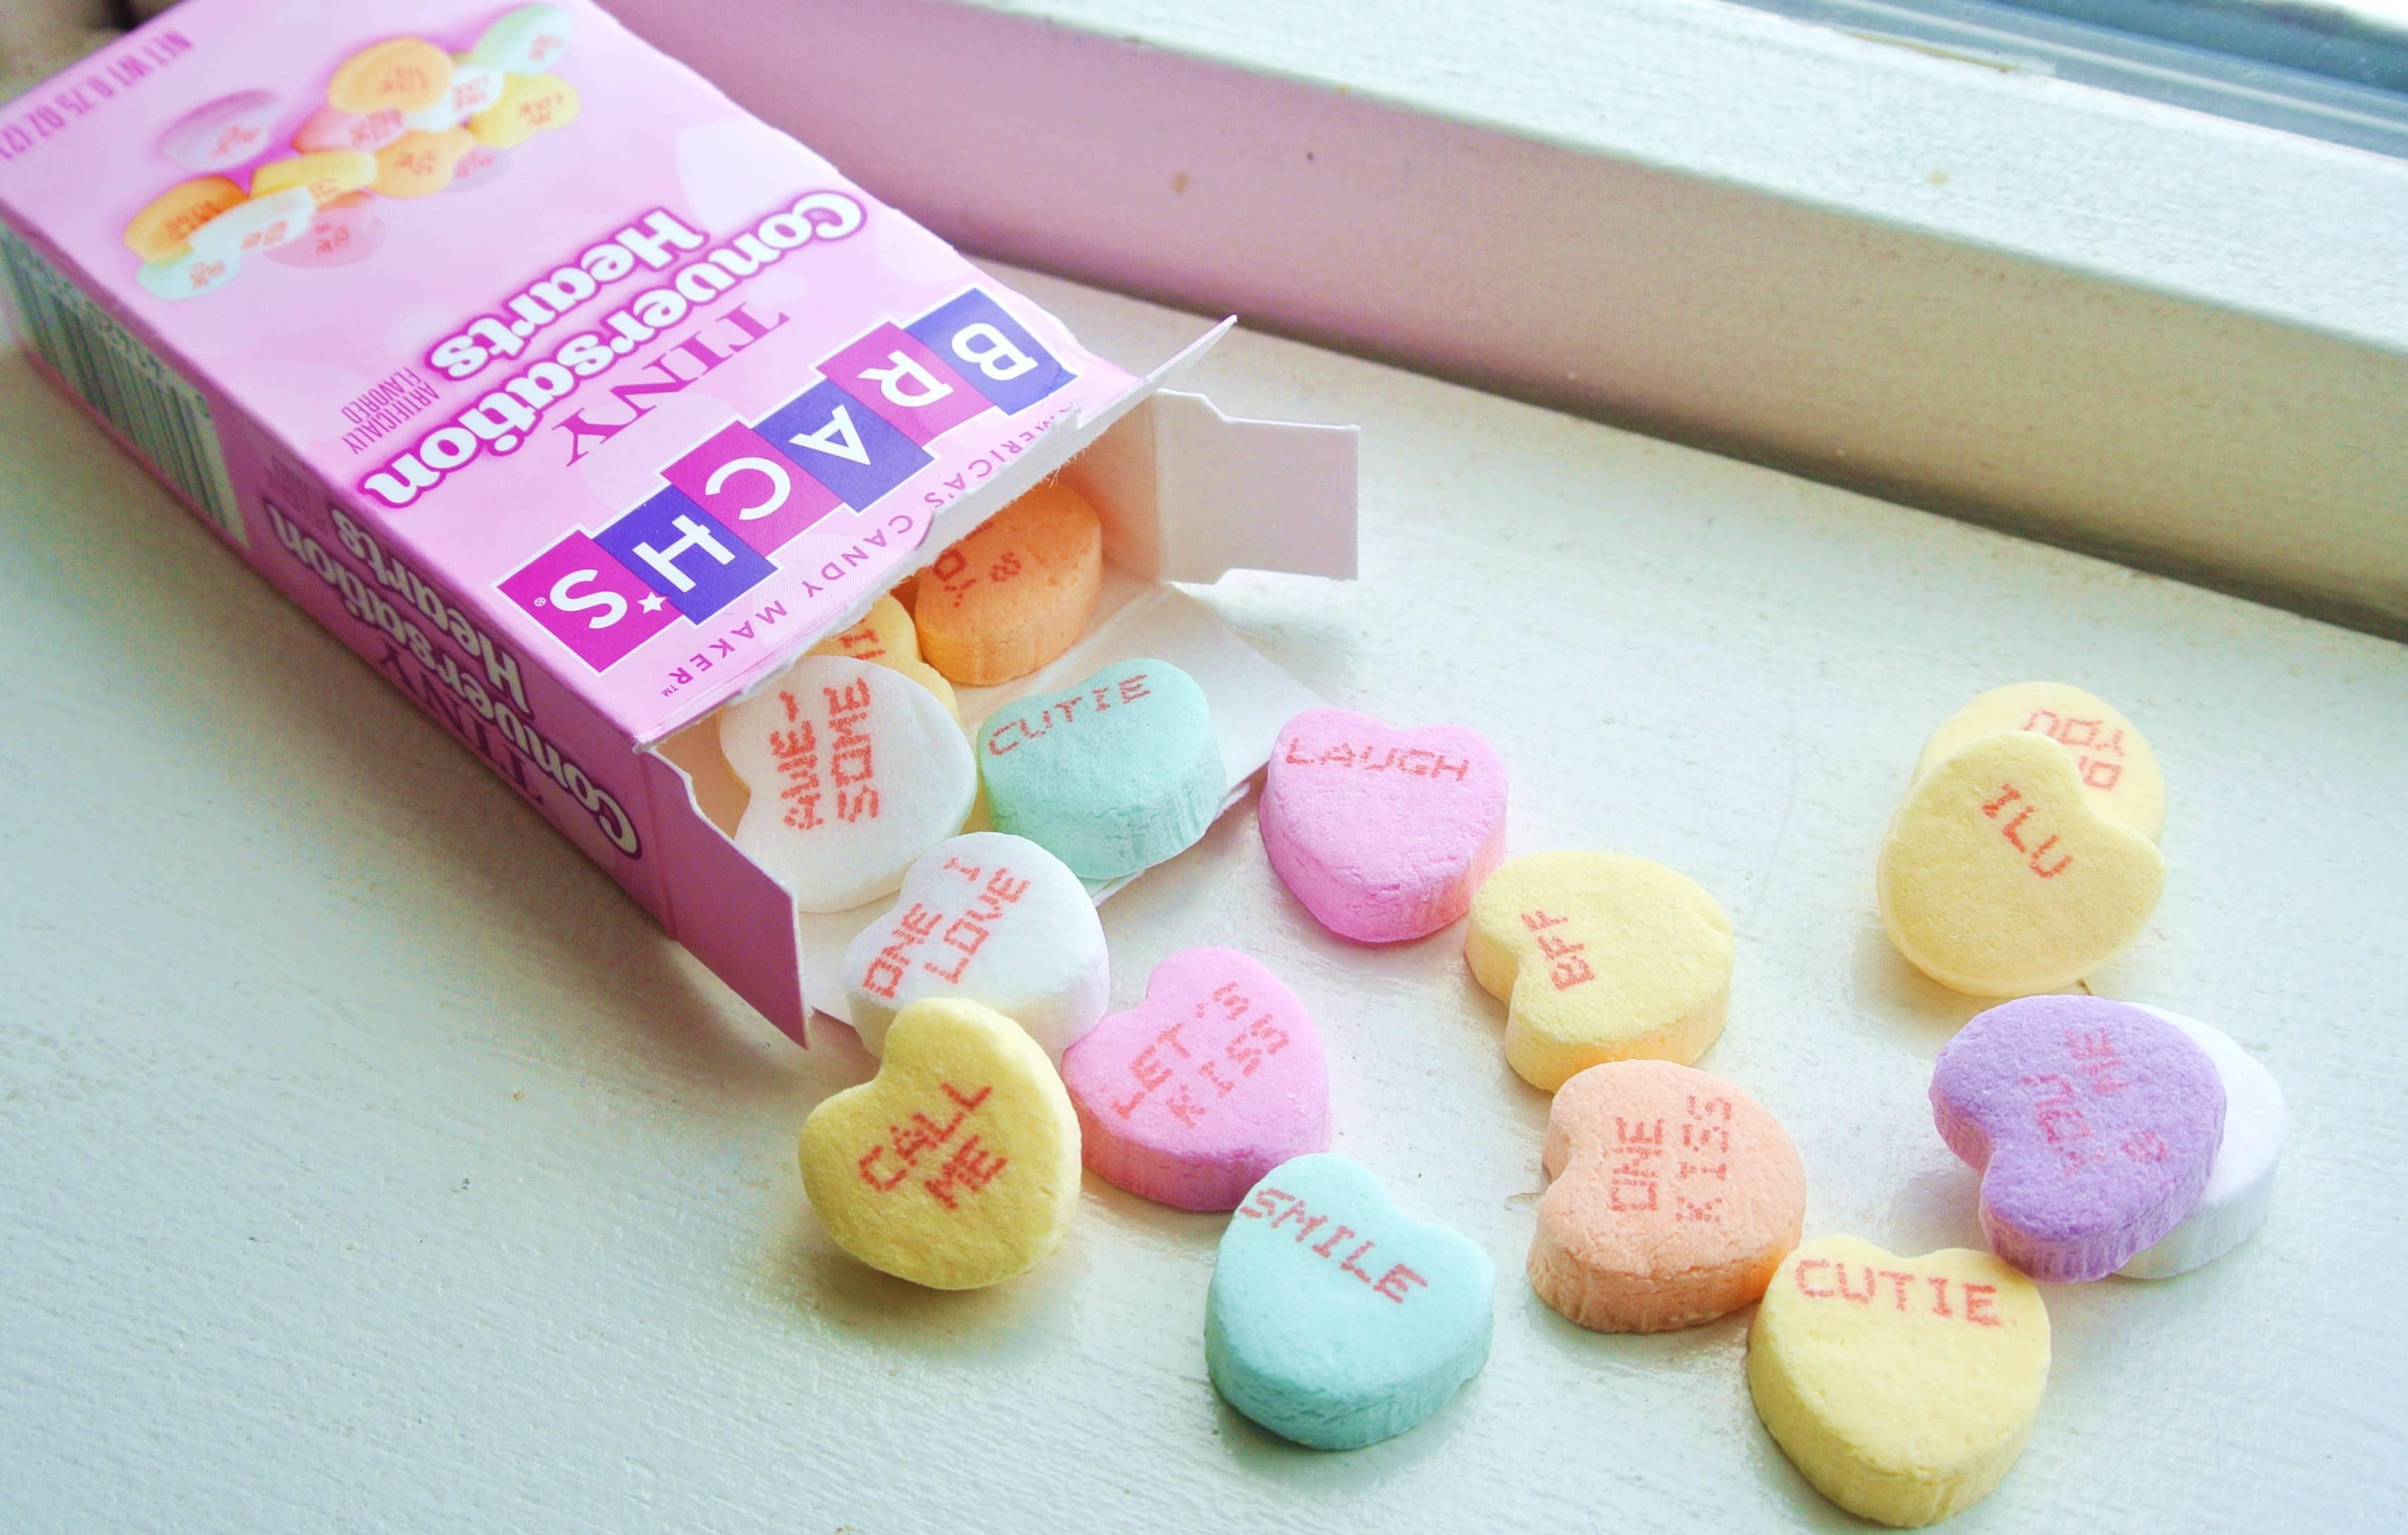 Tiny Brach's Conversation Hearts Candy